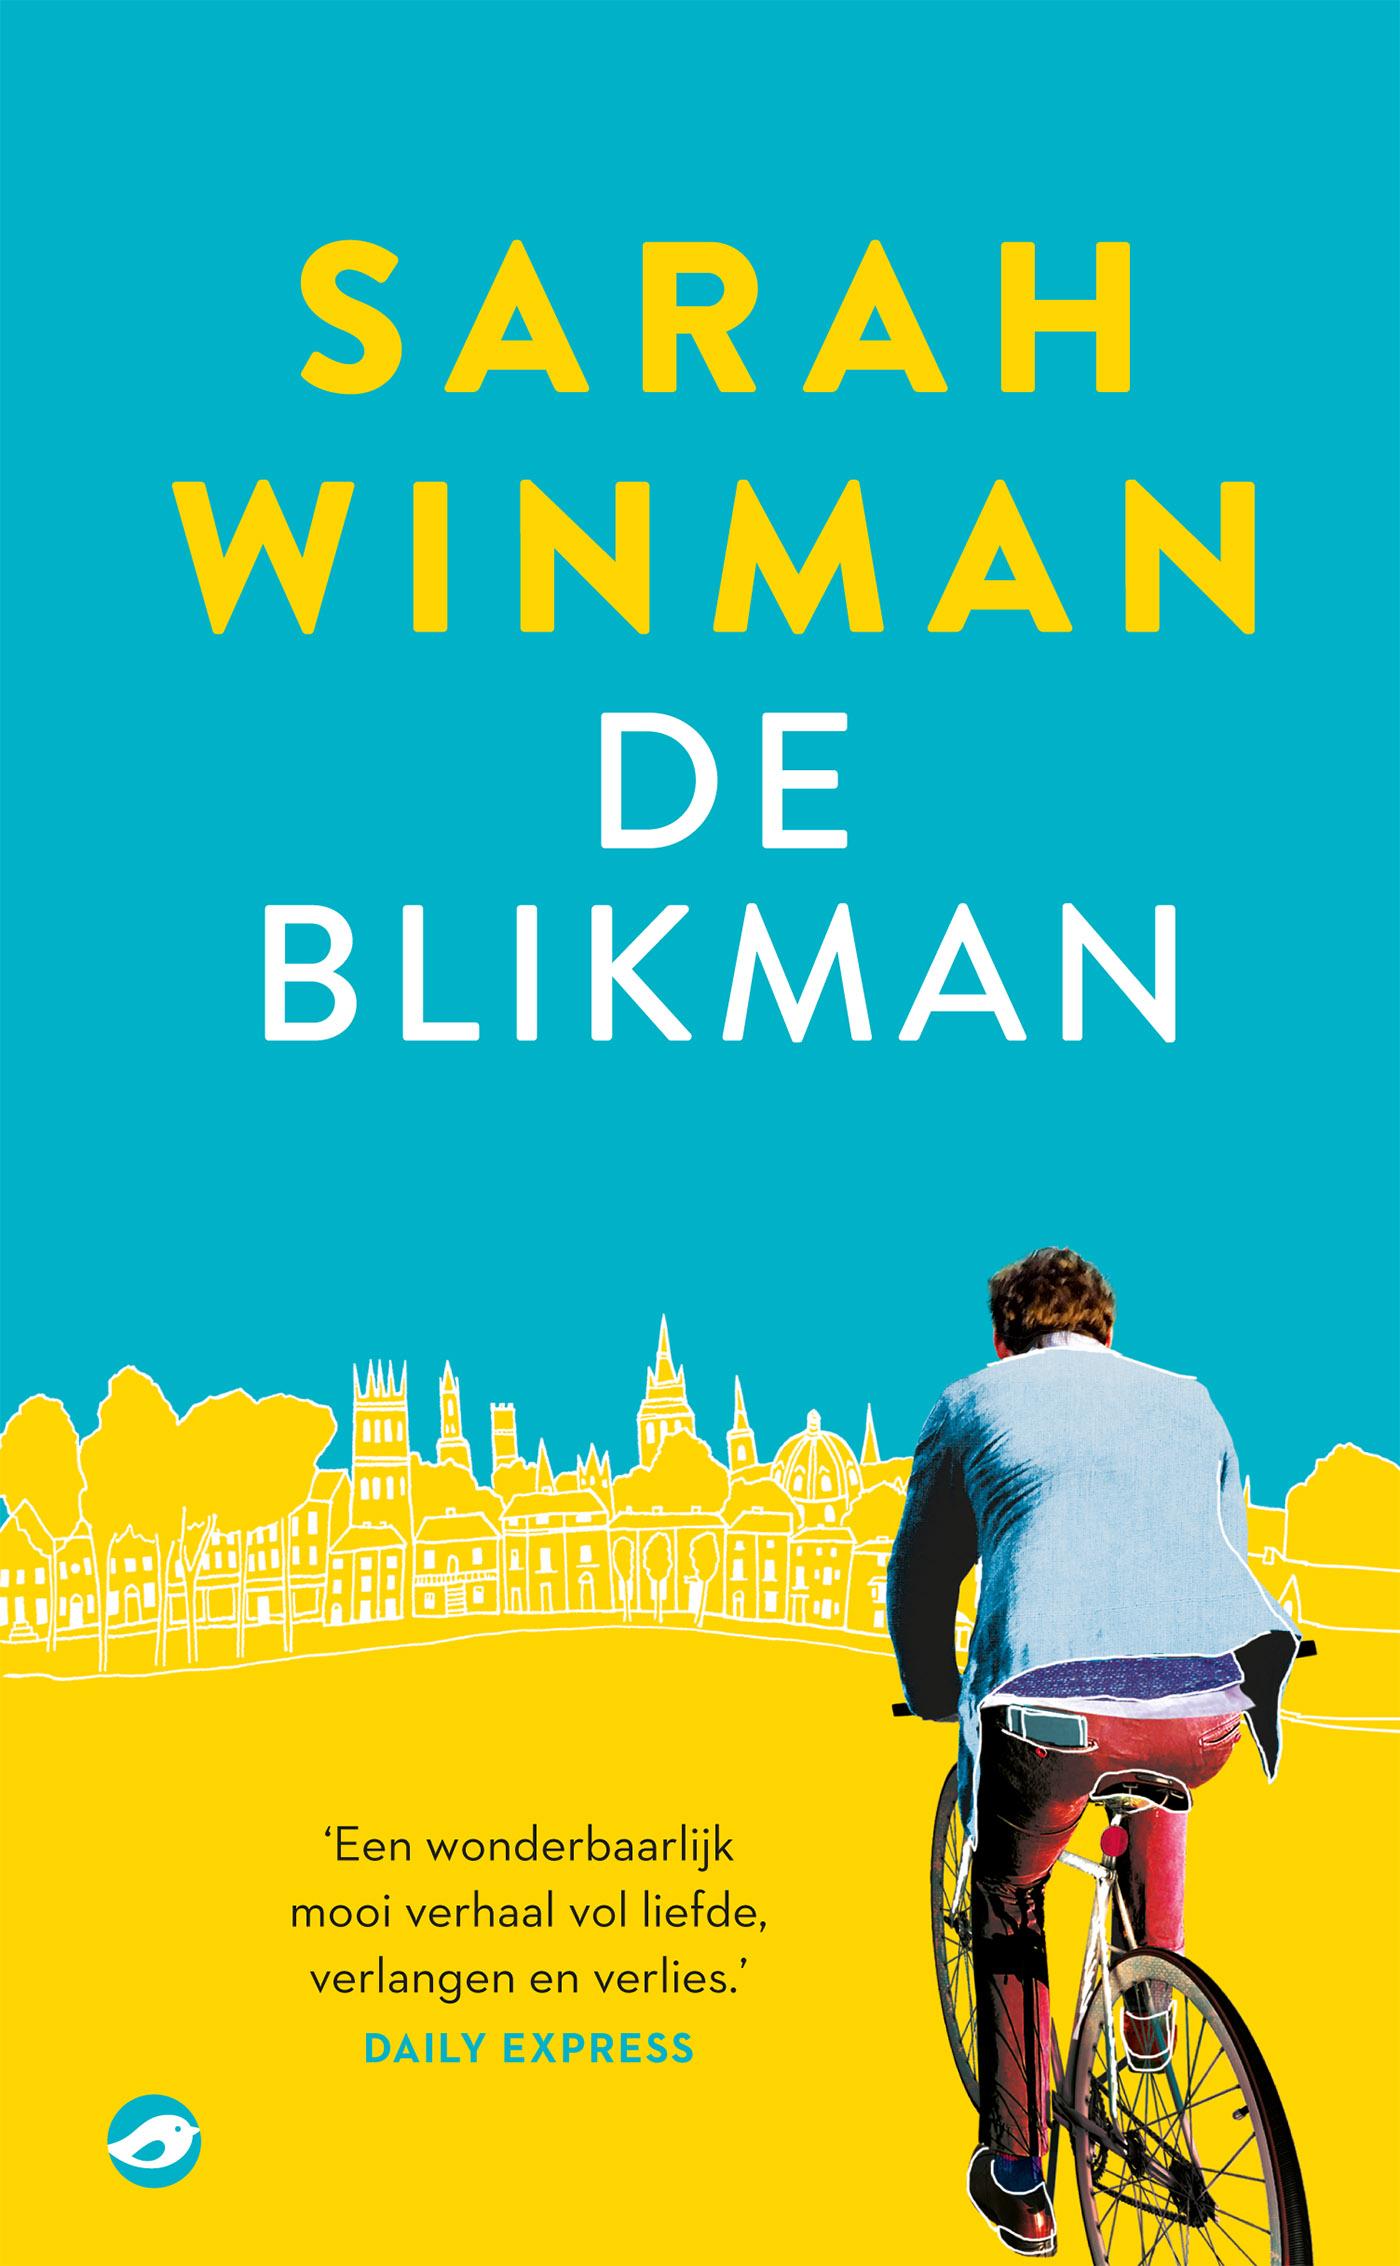 Sarah Winman De blikman